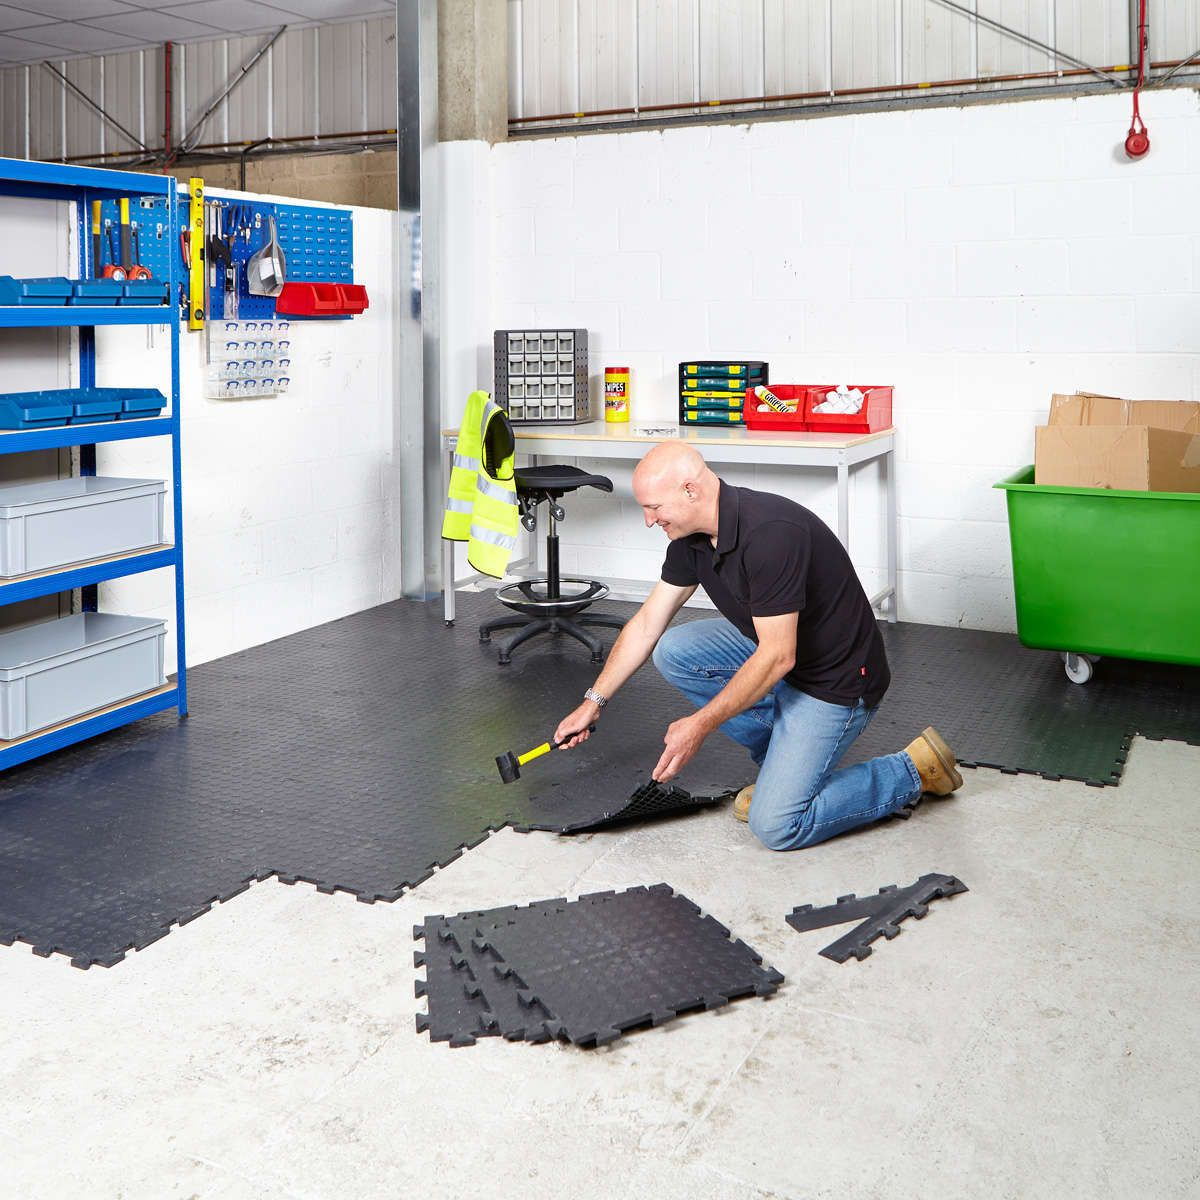 Interlocking garage floor tiles installation for the home interlocking garage floor tiles installation dailygadgetfo Image collections